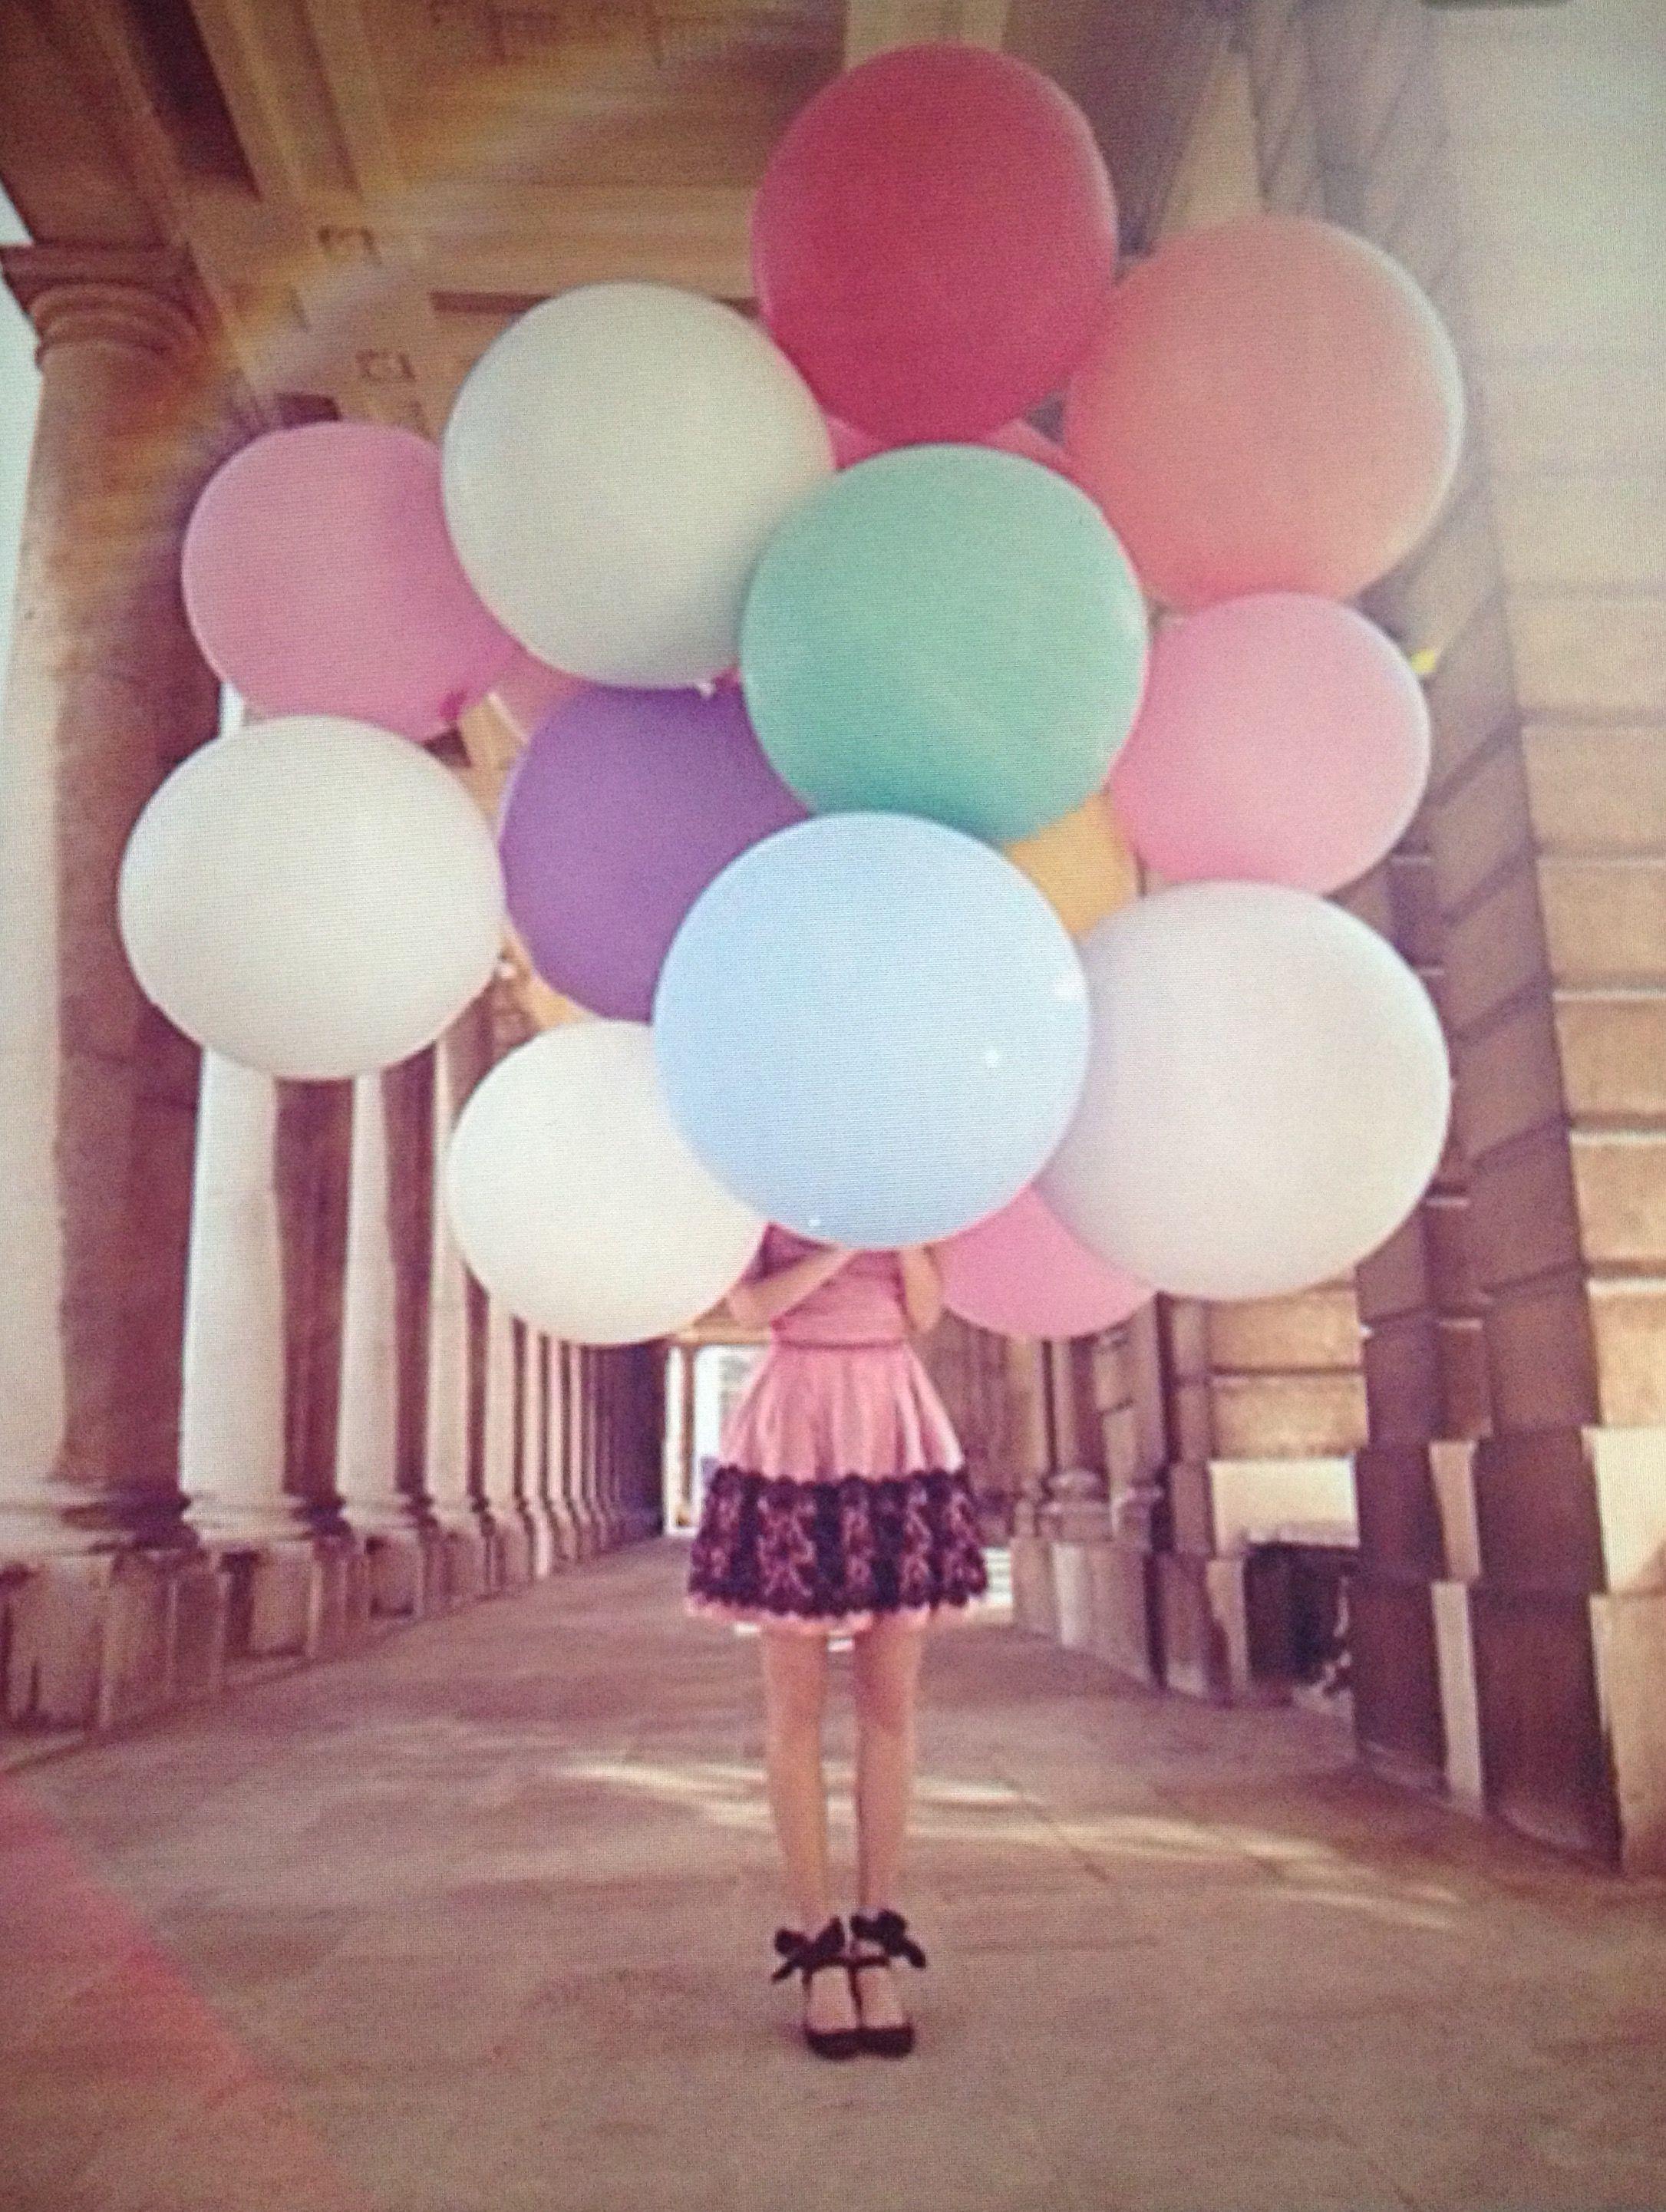 Wedding decoration ideas balloons  Pin by Elisa Cortés on Burbujas globos y gotitas  Pinterest